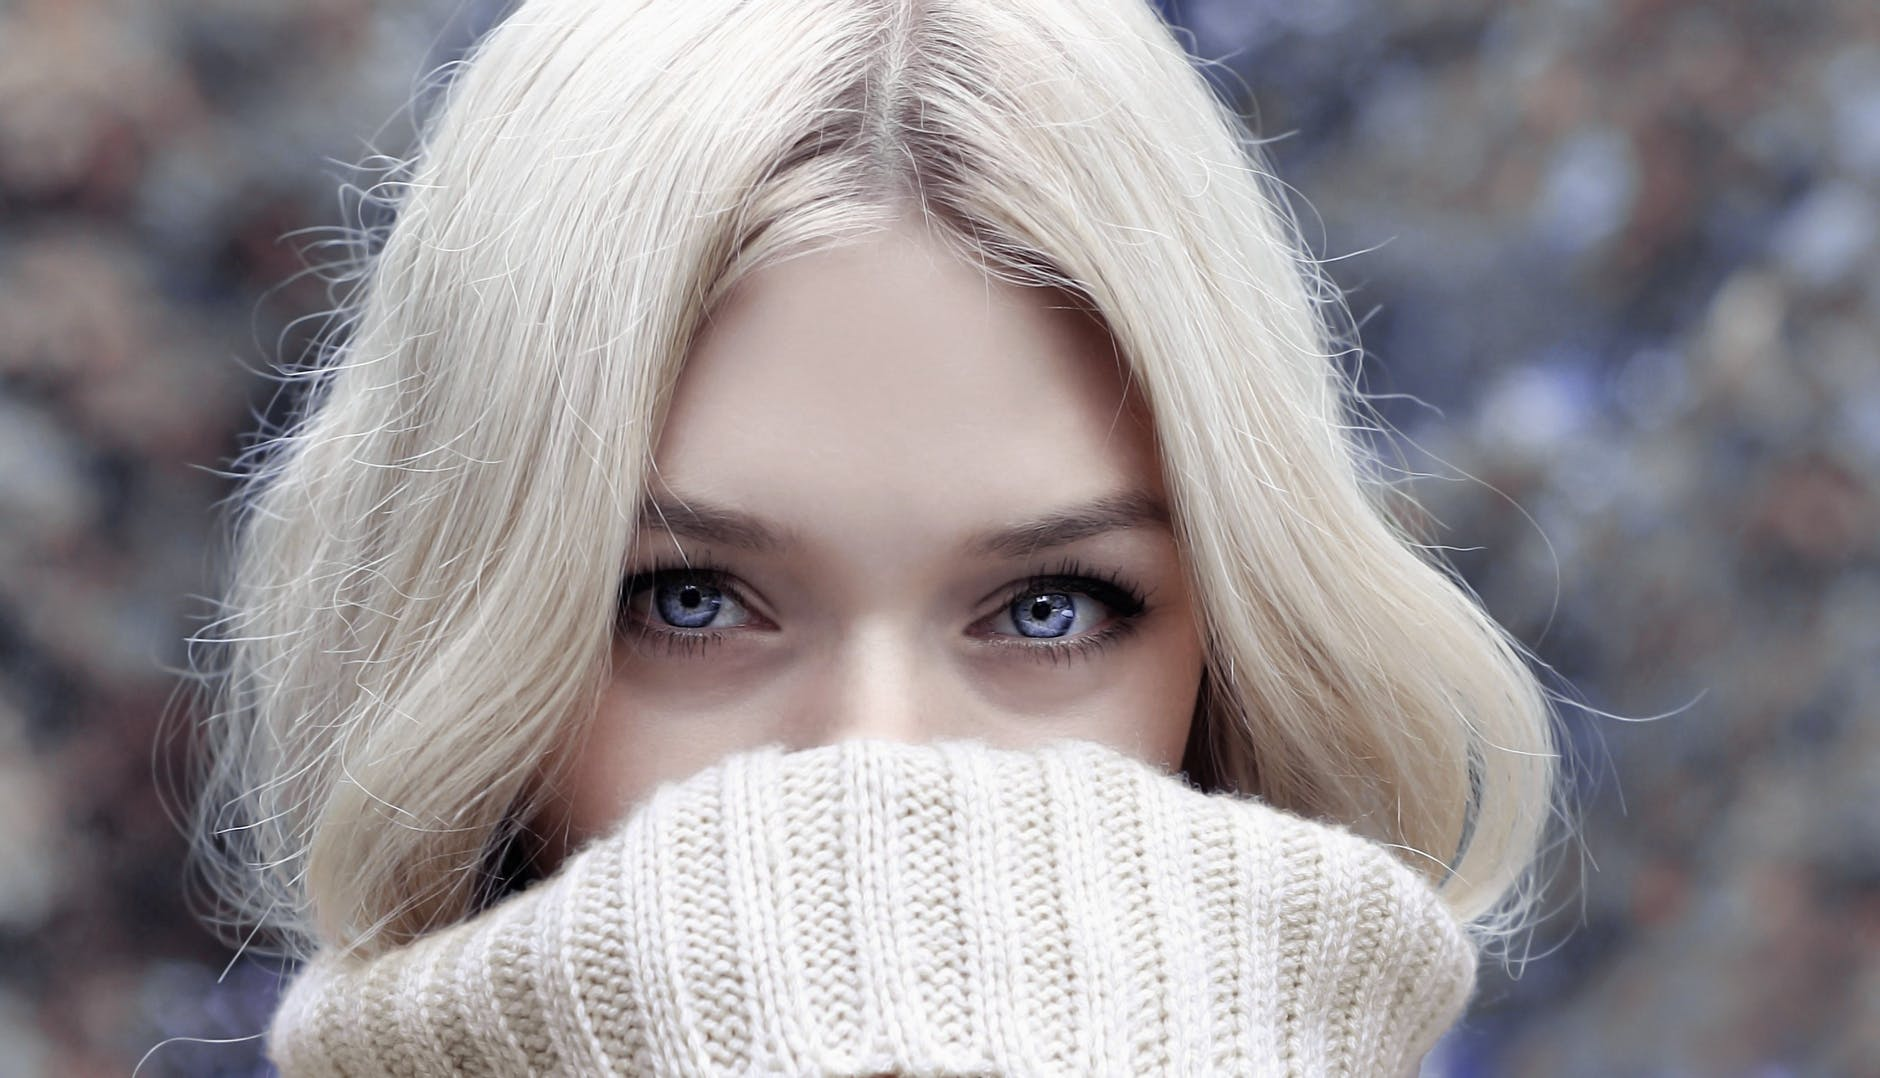 beautiful beauty blond blur winter blues